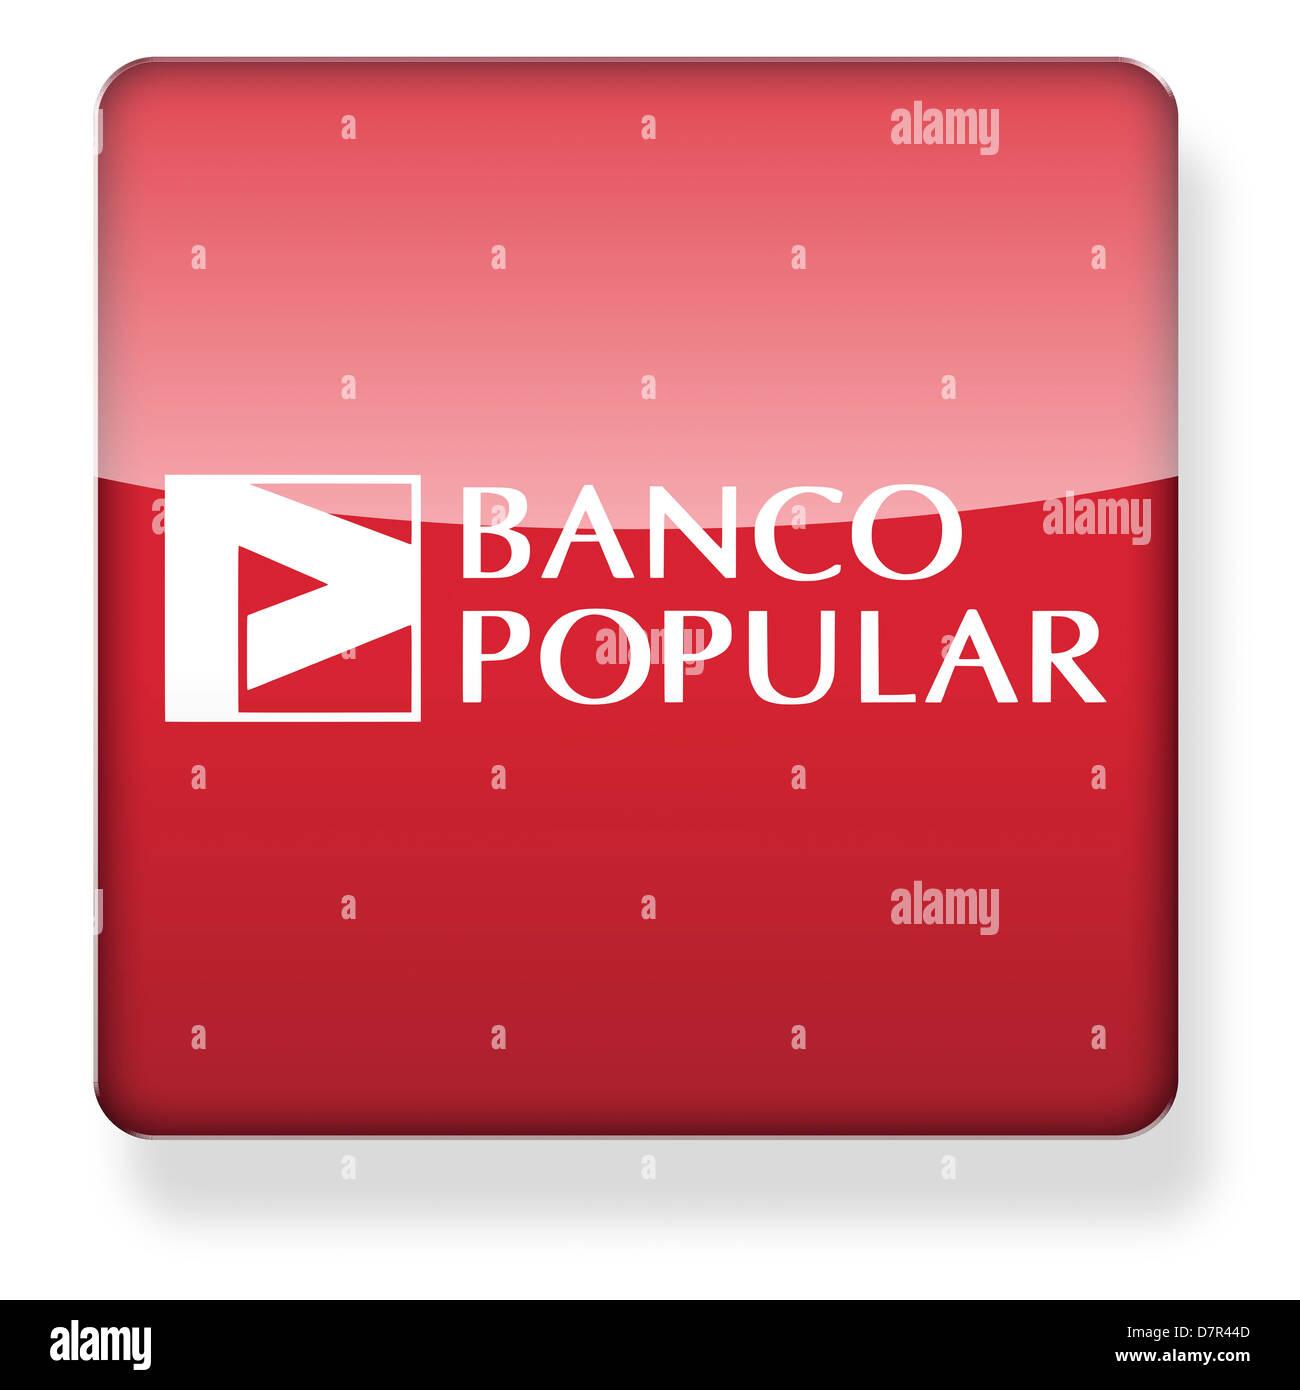 Banco Popular Logo als ein app-Symbol. Clipping-Pfad enthalten. Stockfoto